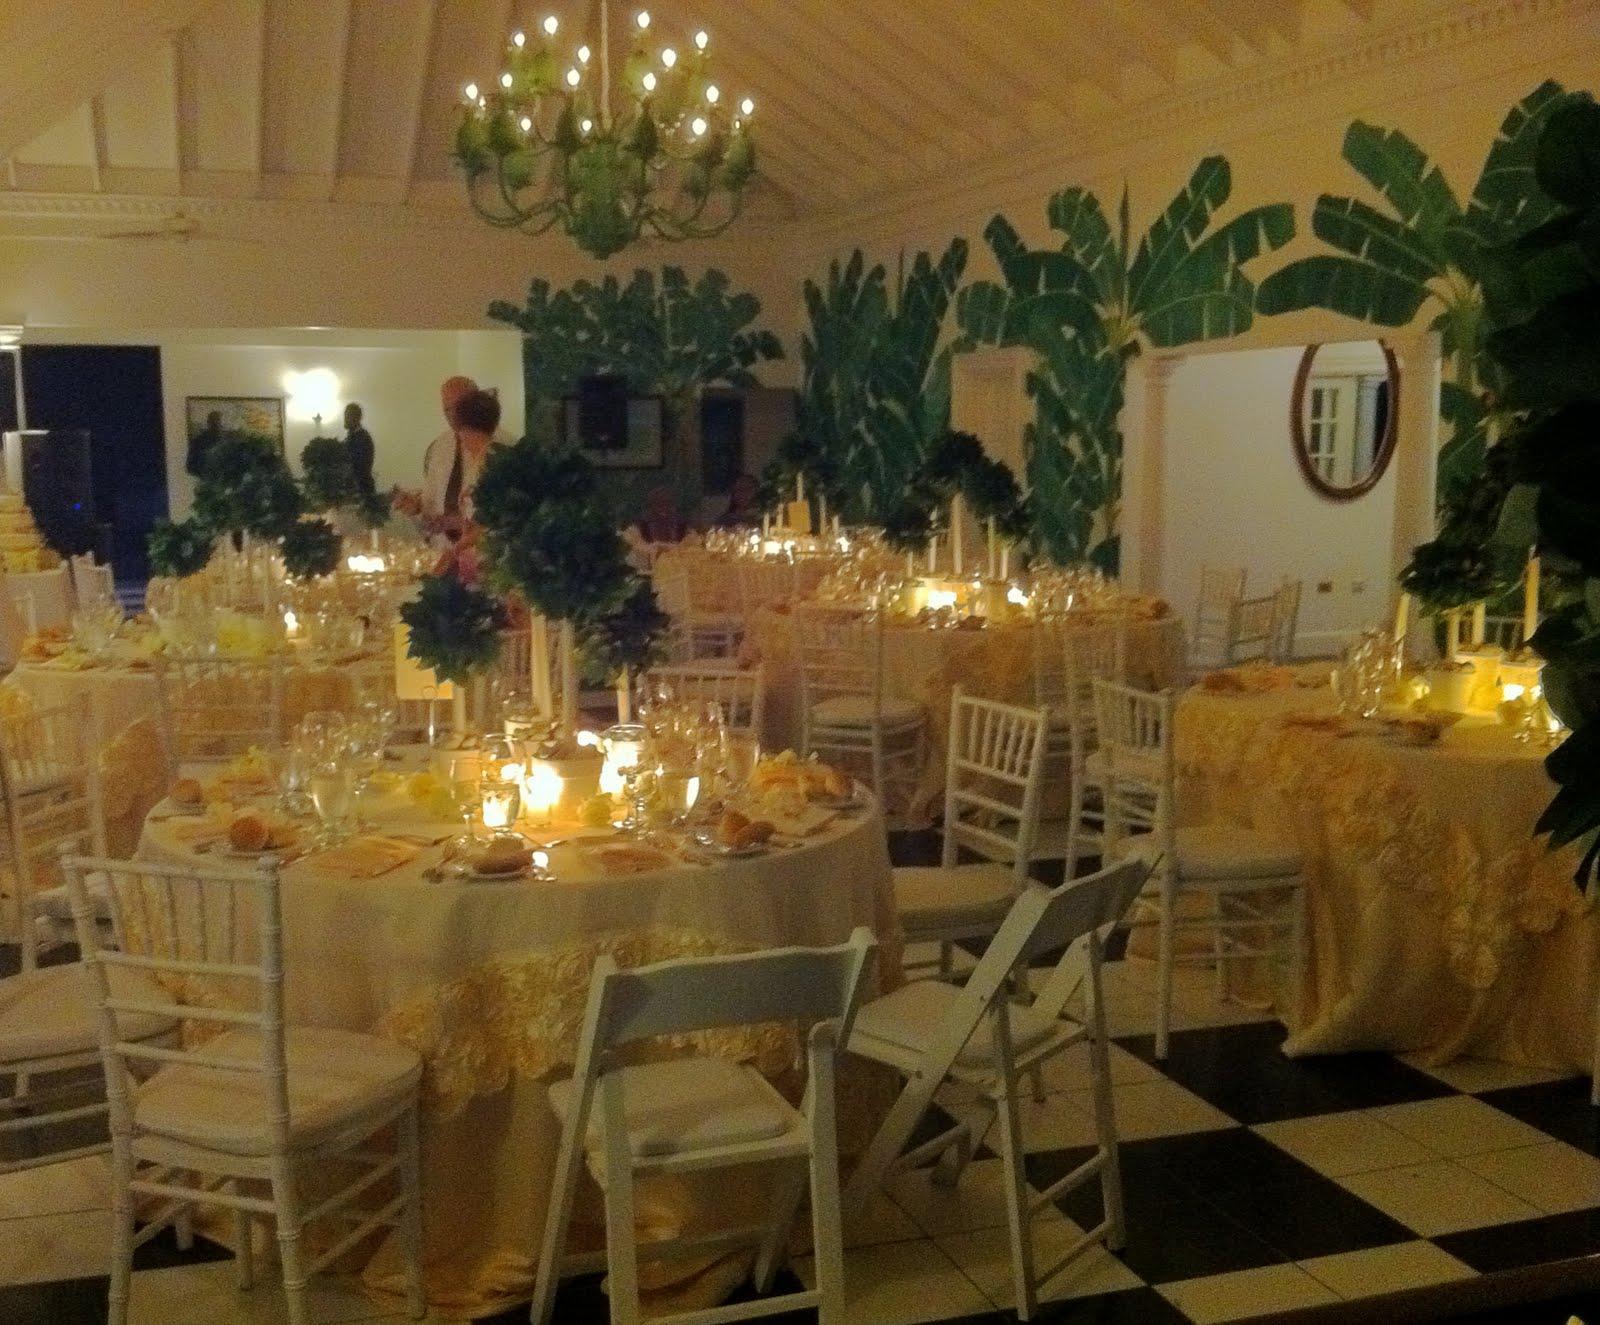 Caribbean Wedding Favor Ideas: Shanell's Blog: Caribbean Weddings Caribbean Wedding